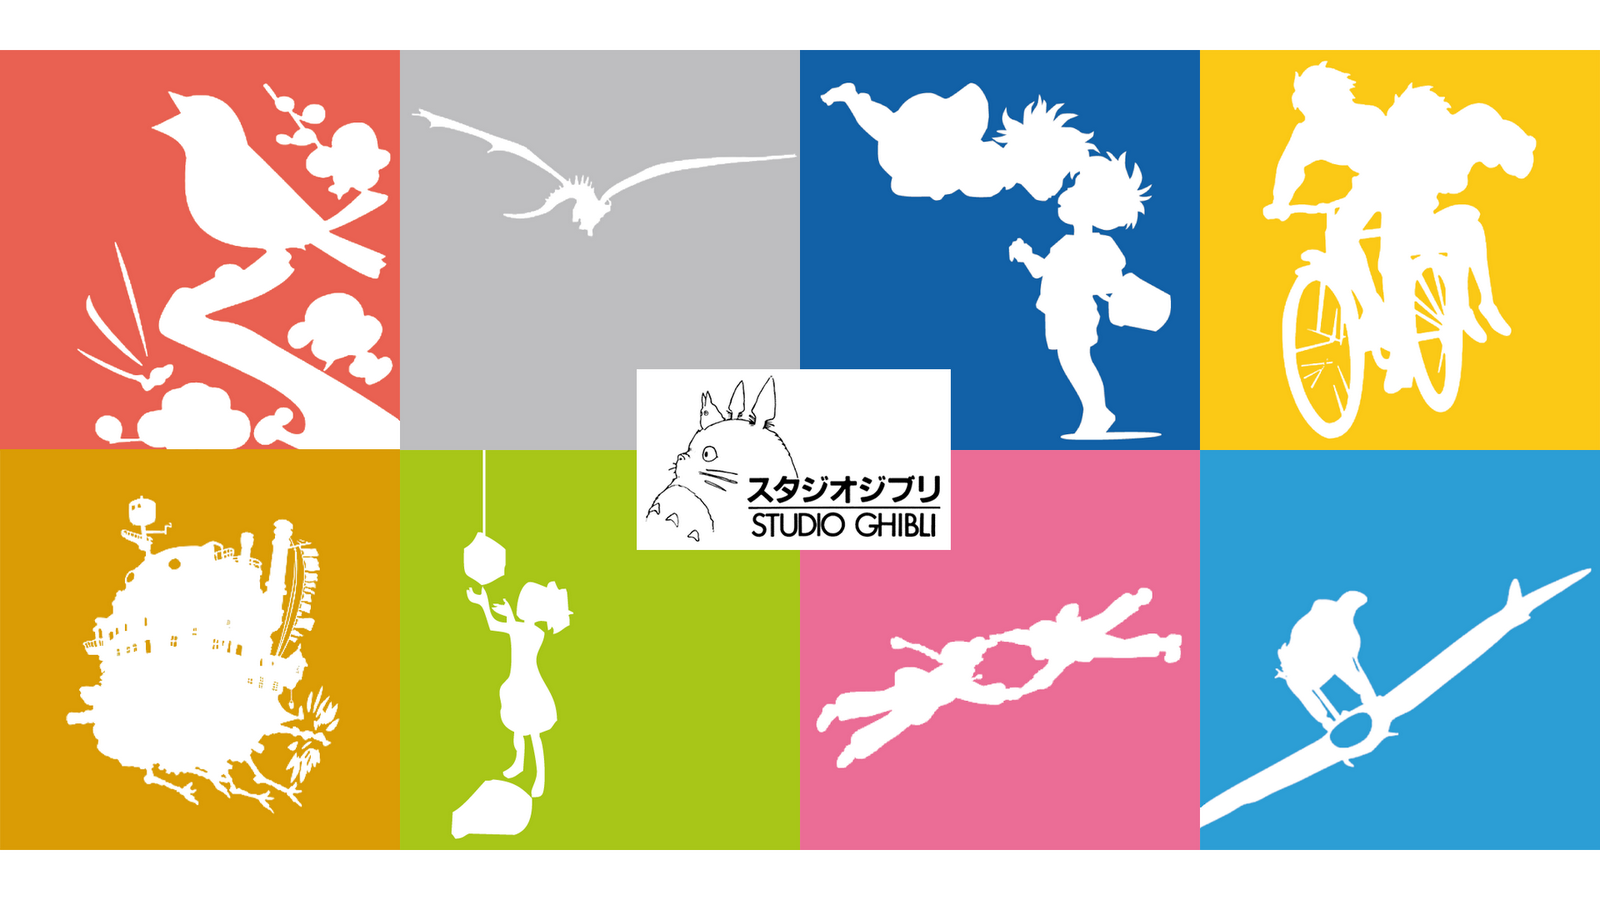 Studio_Ghibli-1920x1080